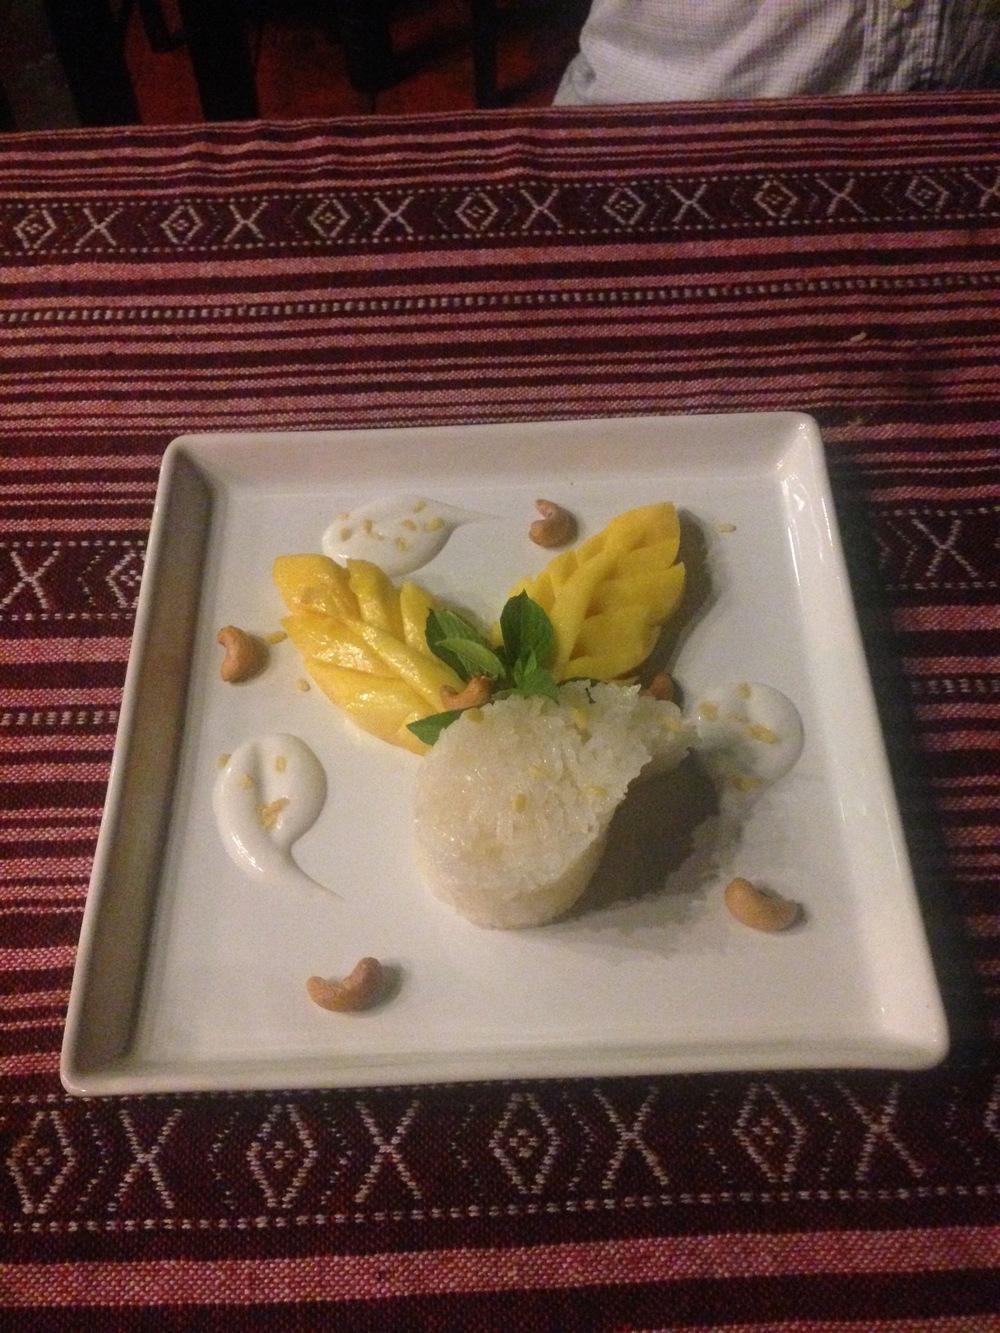 mango-sticky-rice-paak-dang-restaurant-chiang-mai